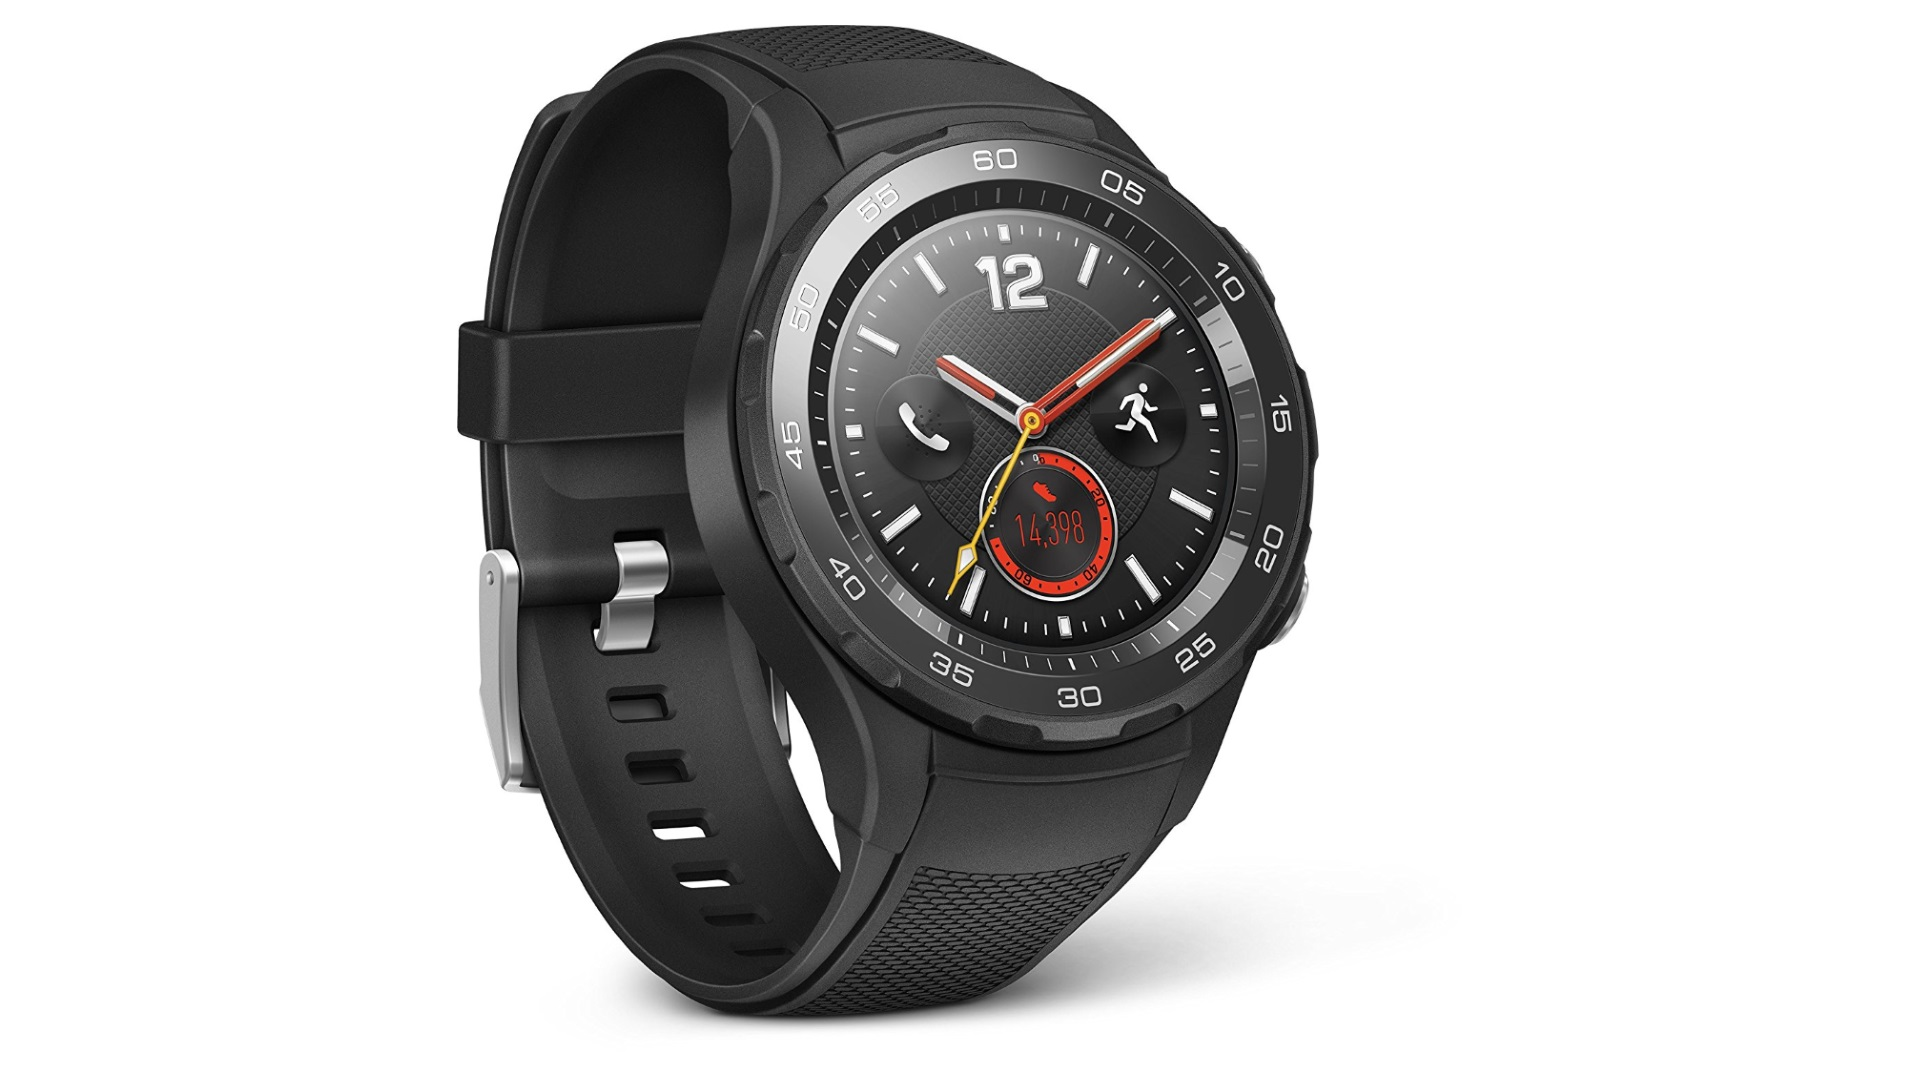 「Huawei Watch 2」セルラーモデルは伊Amazonからの直輸入が激安